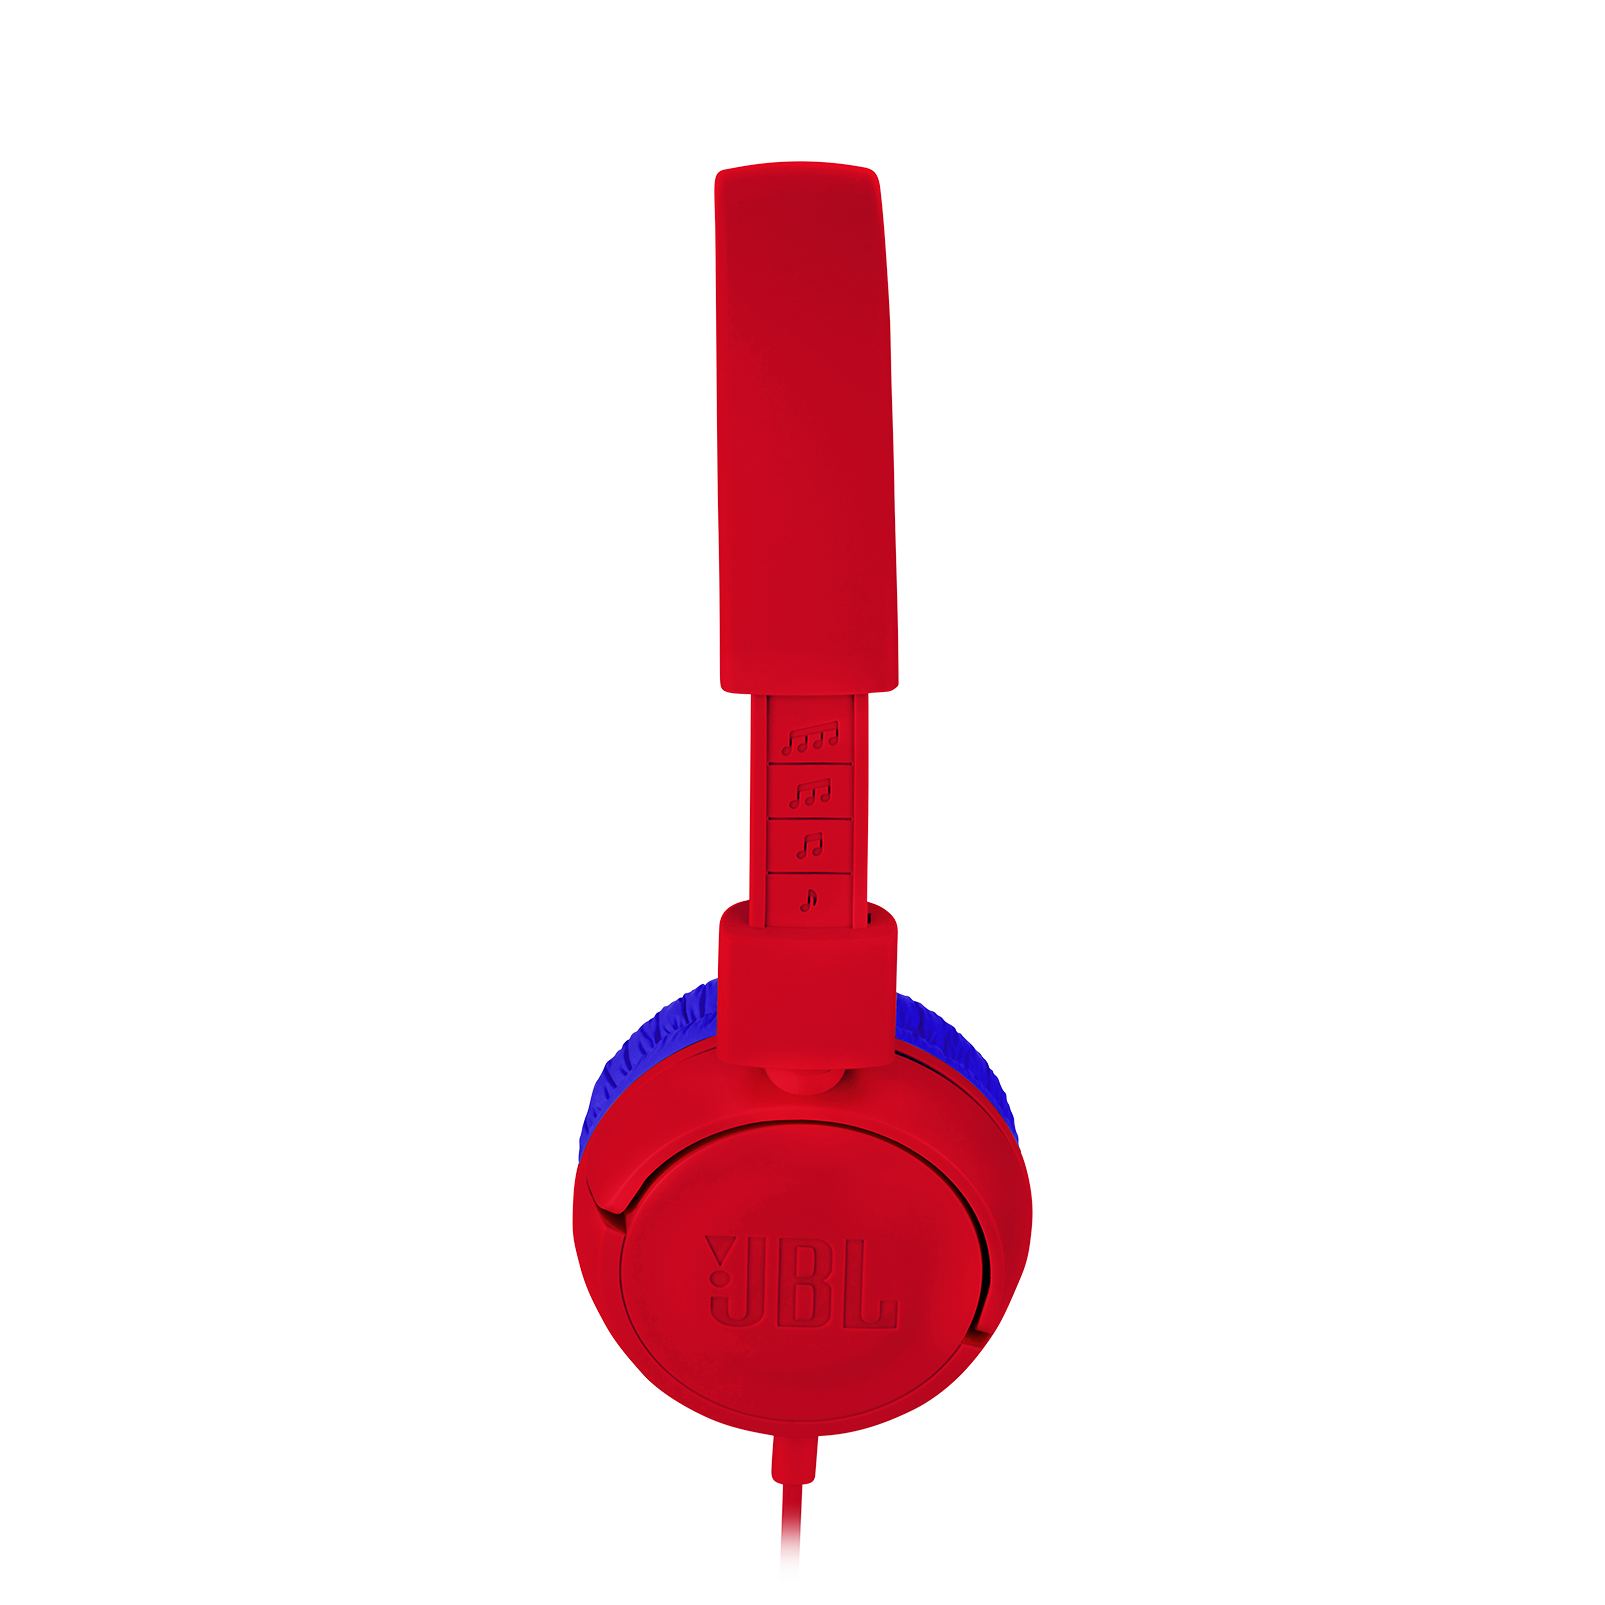 JBL JR300 - Red - Kids on-ear Headphones - Detailshot 2